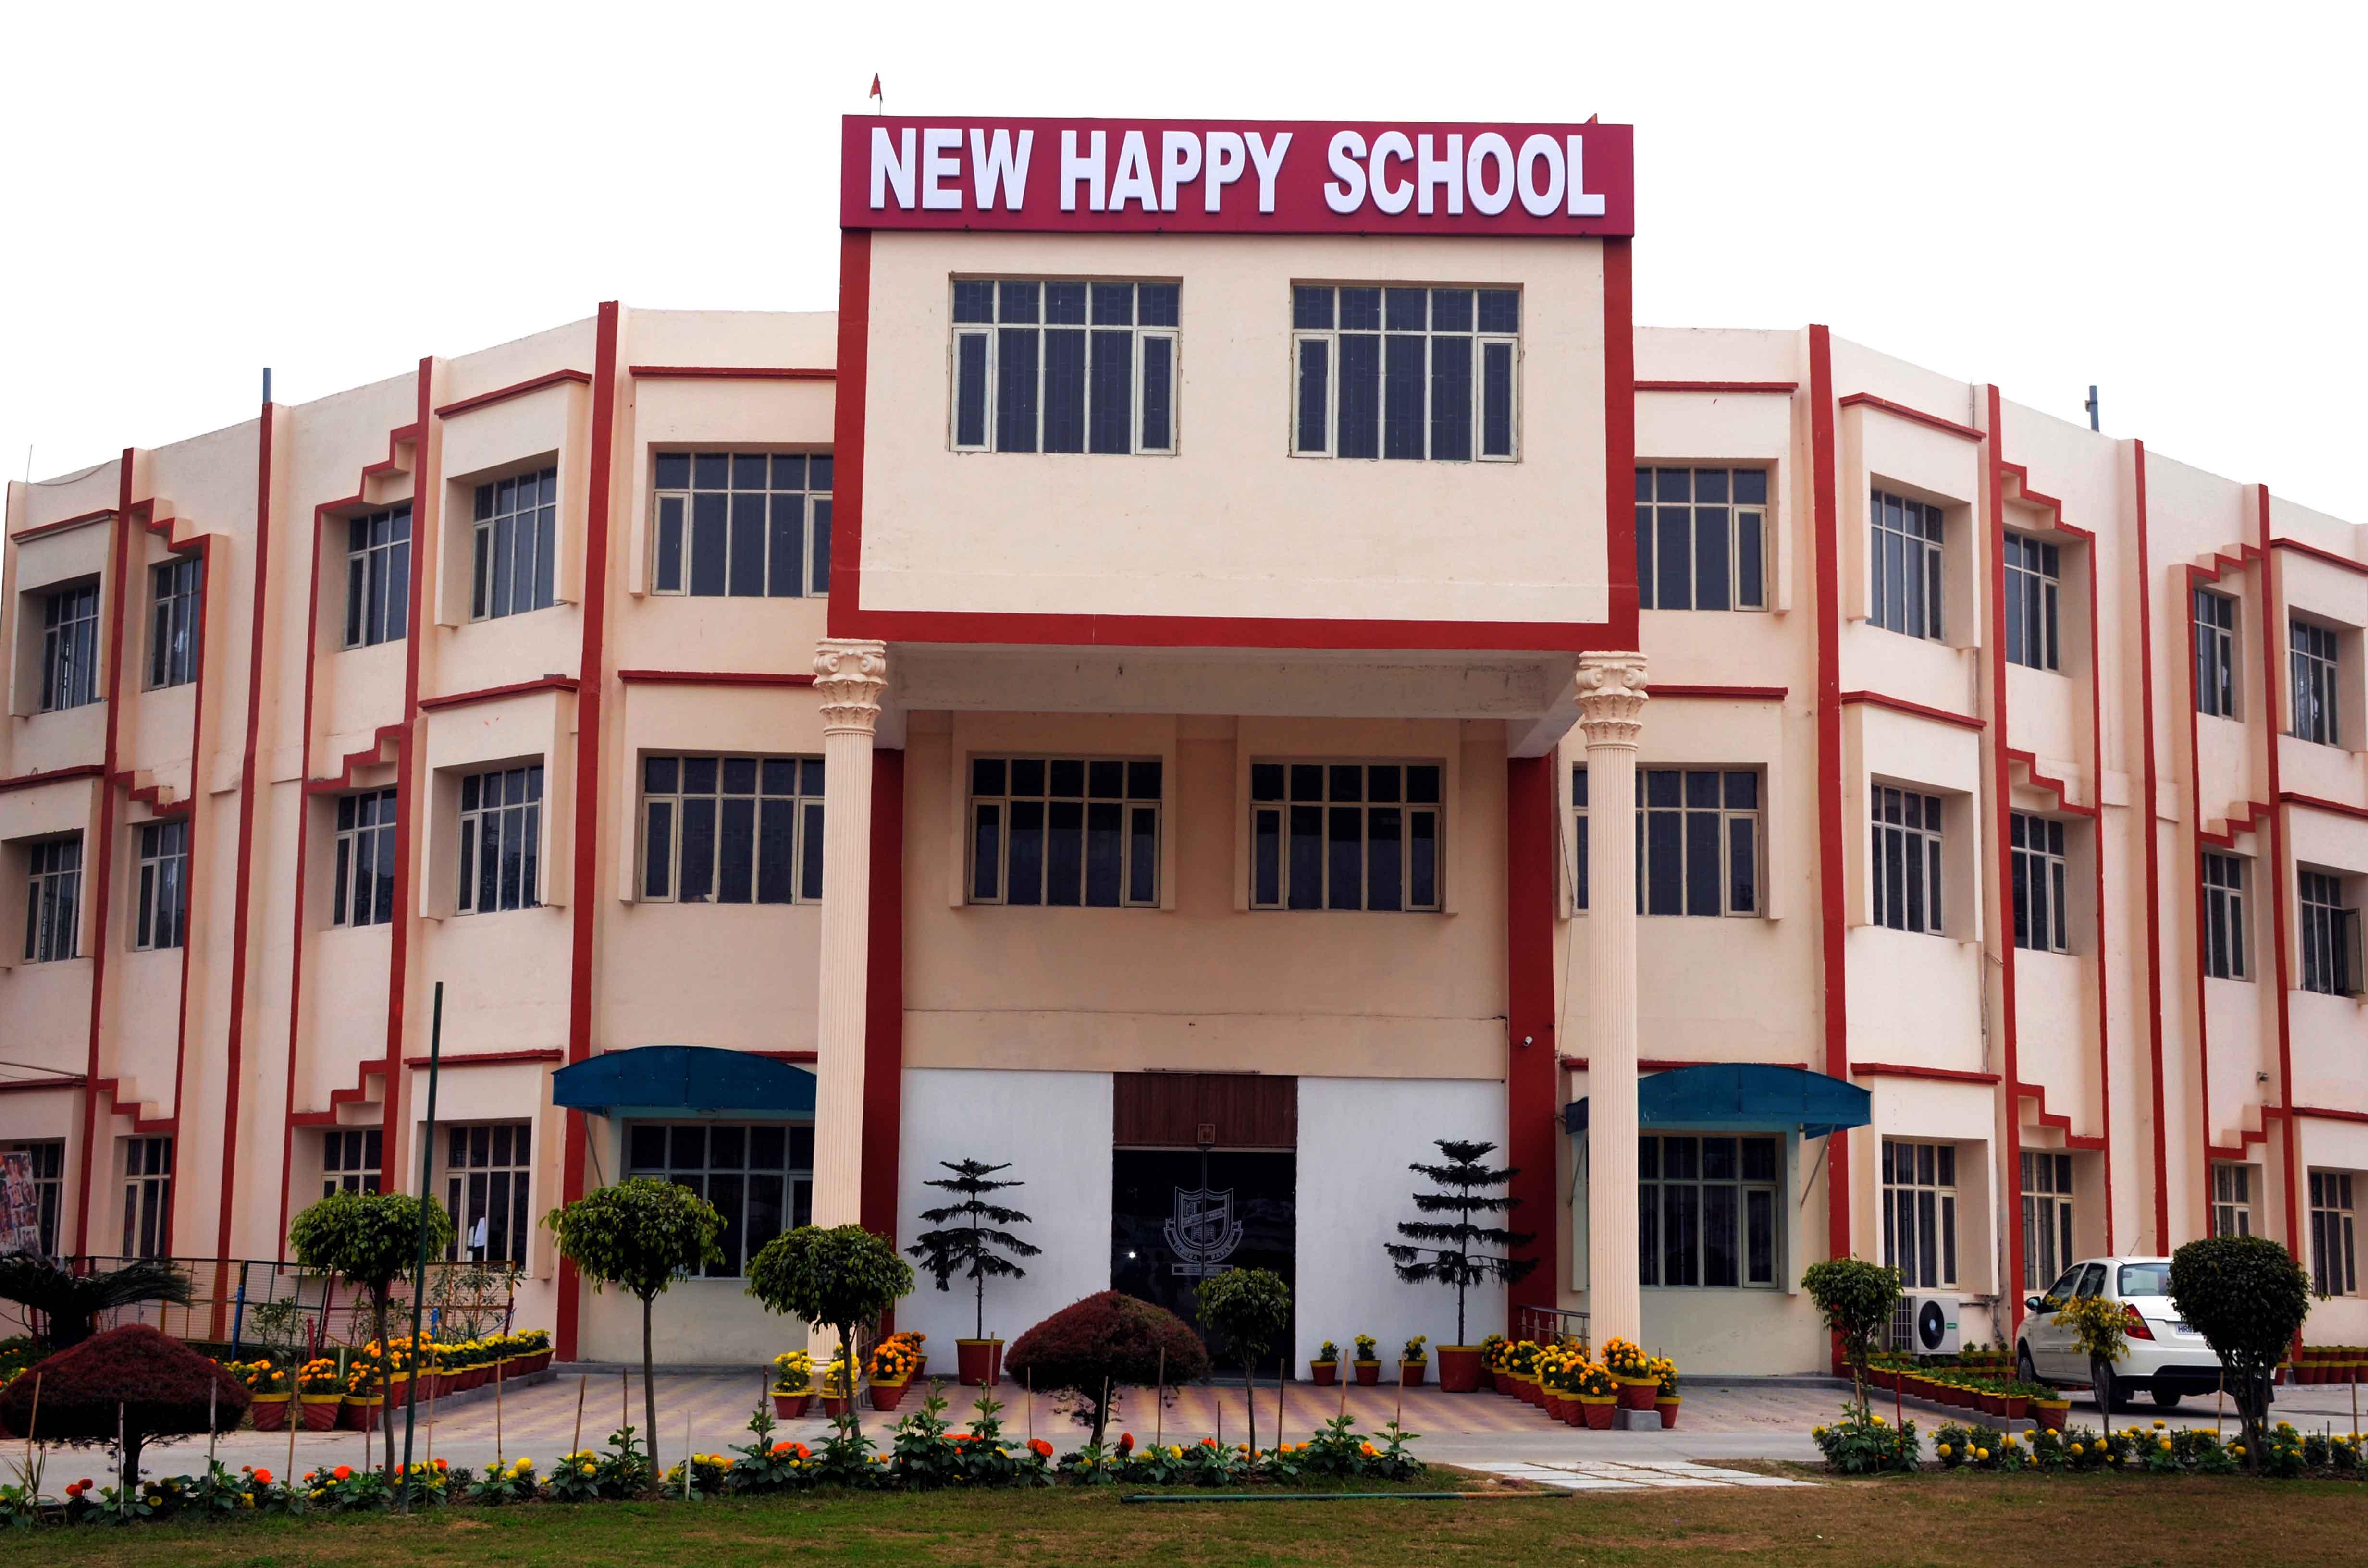 NEW HAPPY PUBLIC SCHOOL CHHACHHURAULI ROAD VPO BILASPUR DISTT YAMUNA NAGAR HARYANA 530424